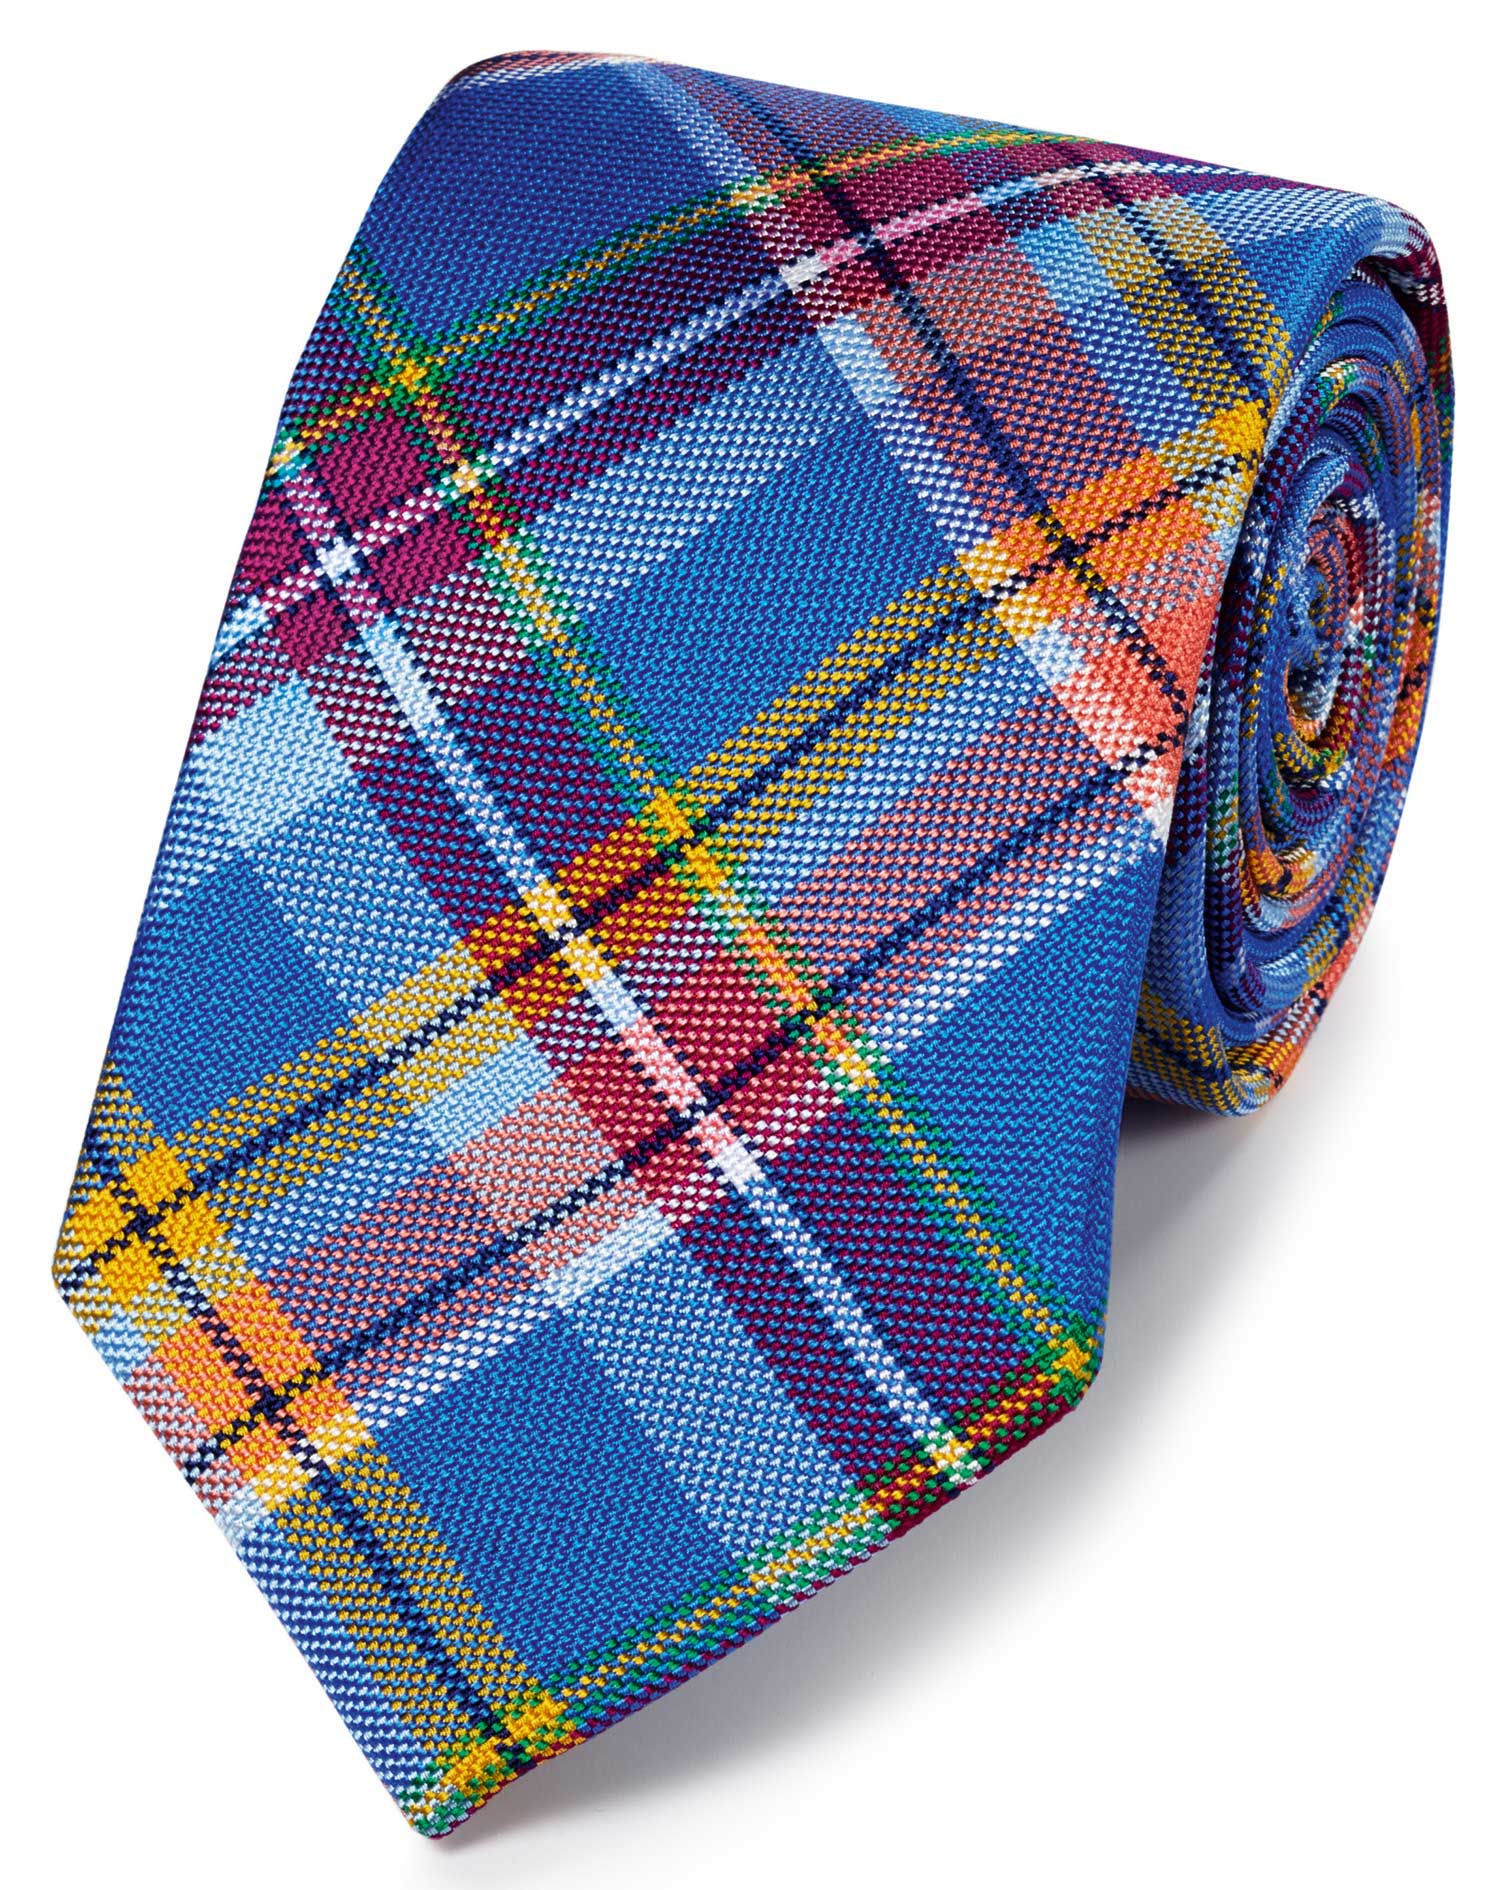 cravate bleu roi en luxueuse soie anglaise motif jermyn street charles tyrwhitt. Black Bedroom Furniture Sets. Home Design Ideas